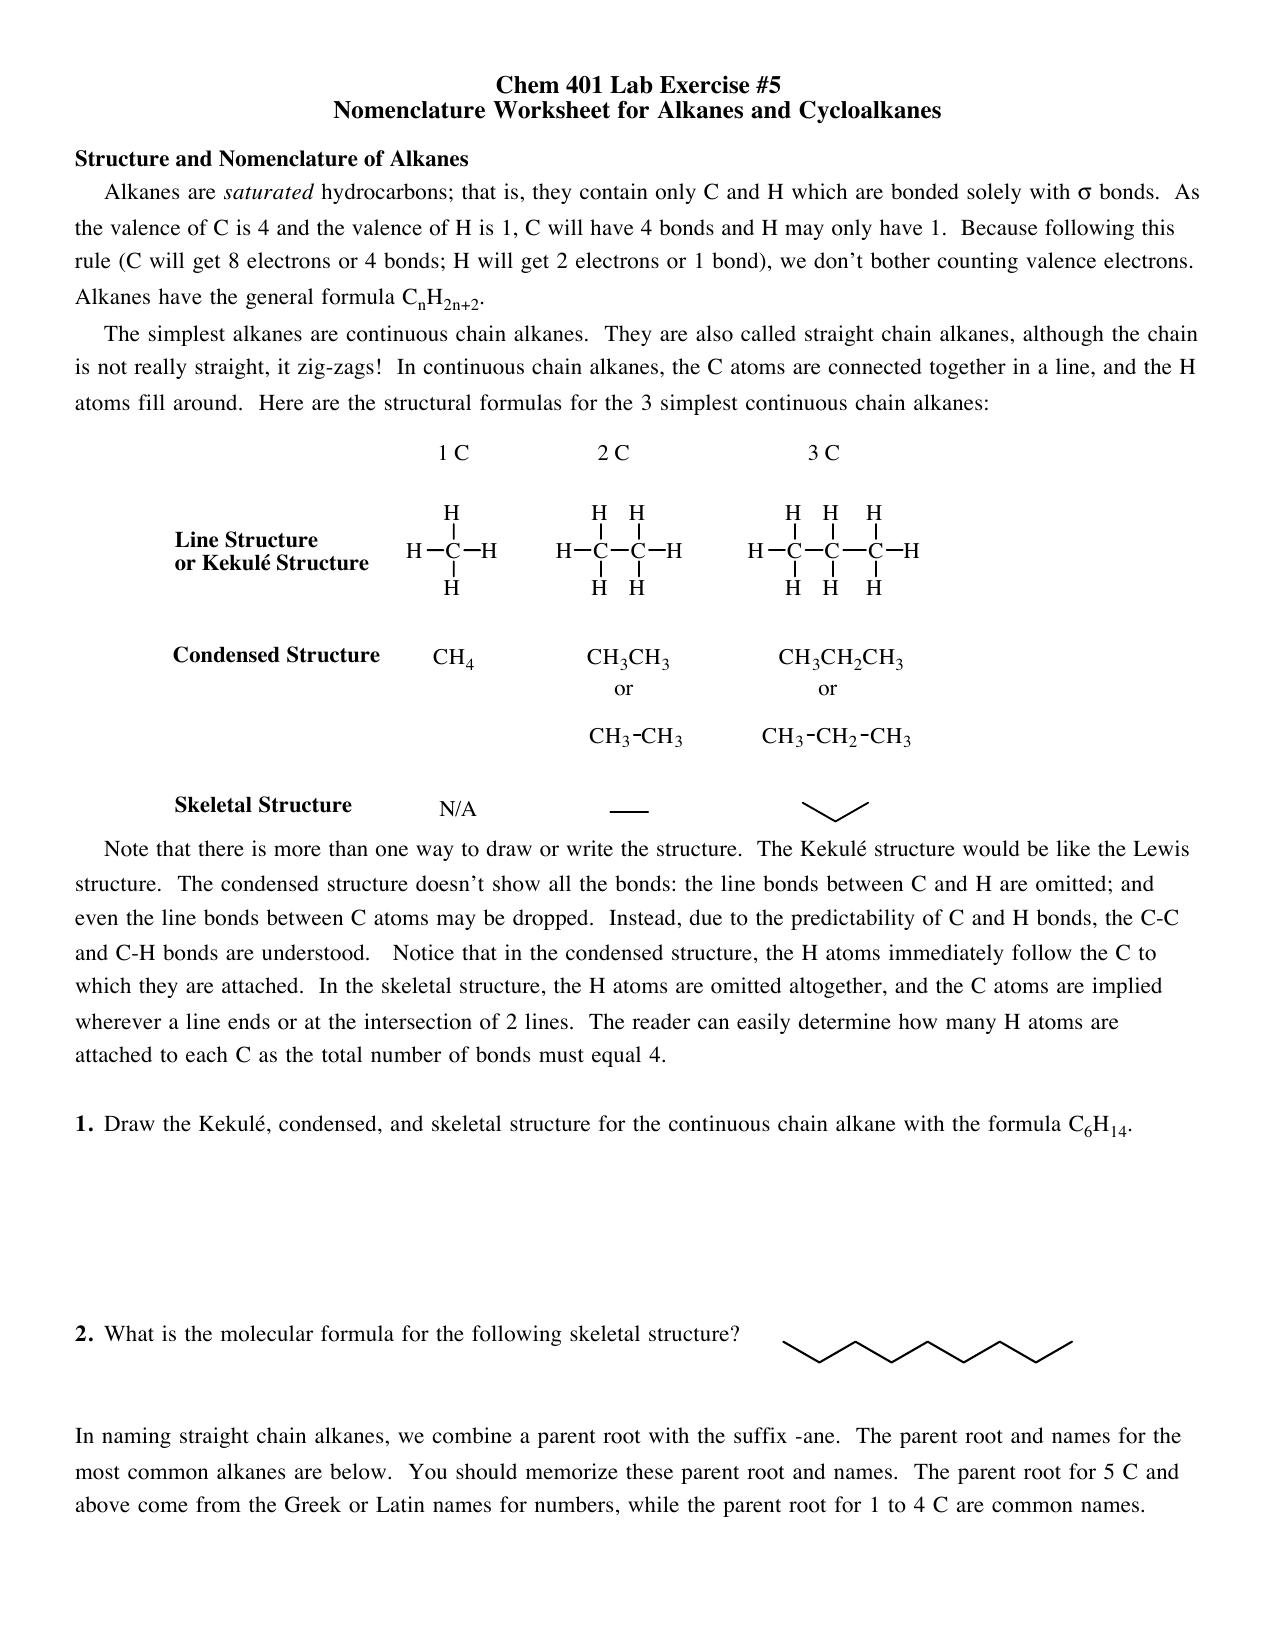 Chem 401 Lab Exercise #5 Nomenclature Worksheet for Alkanes